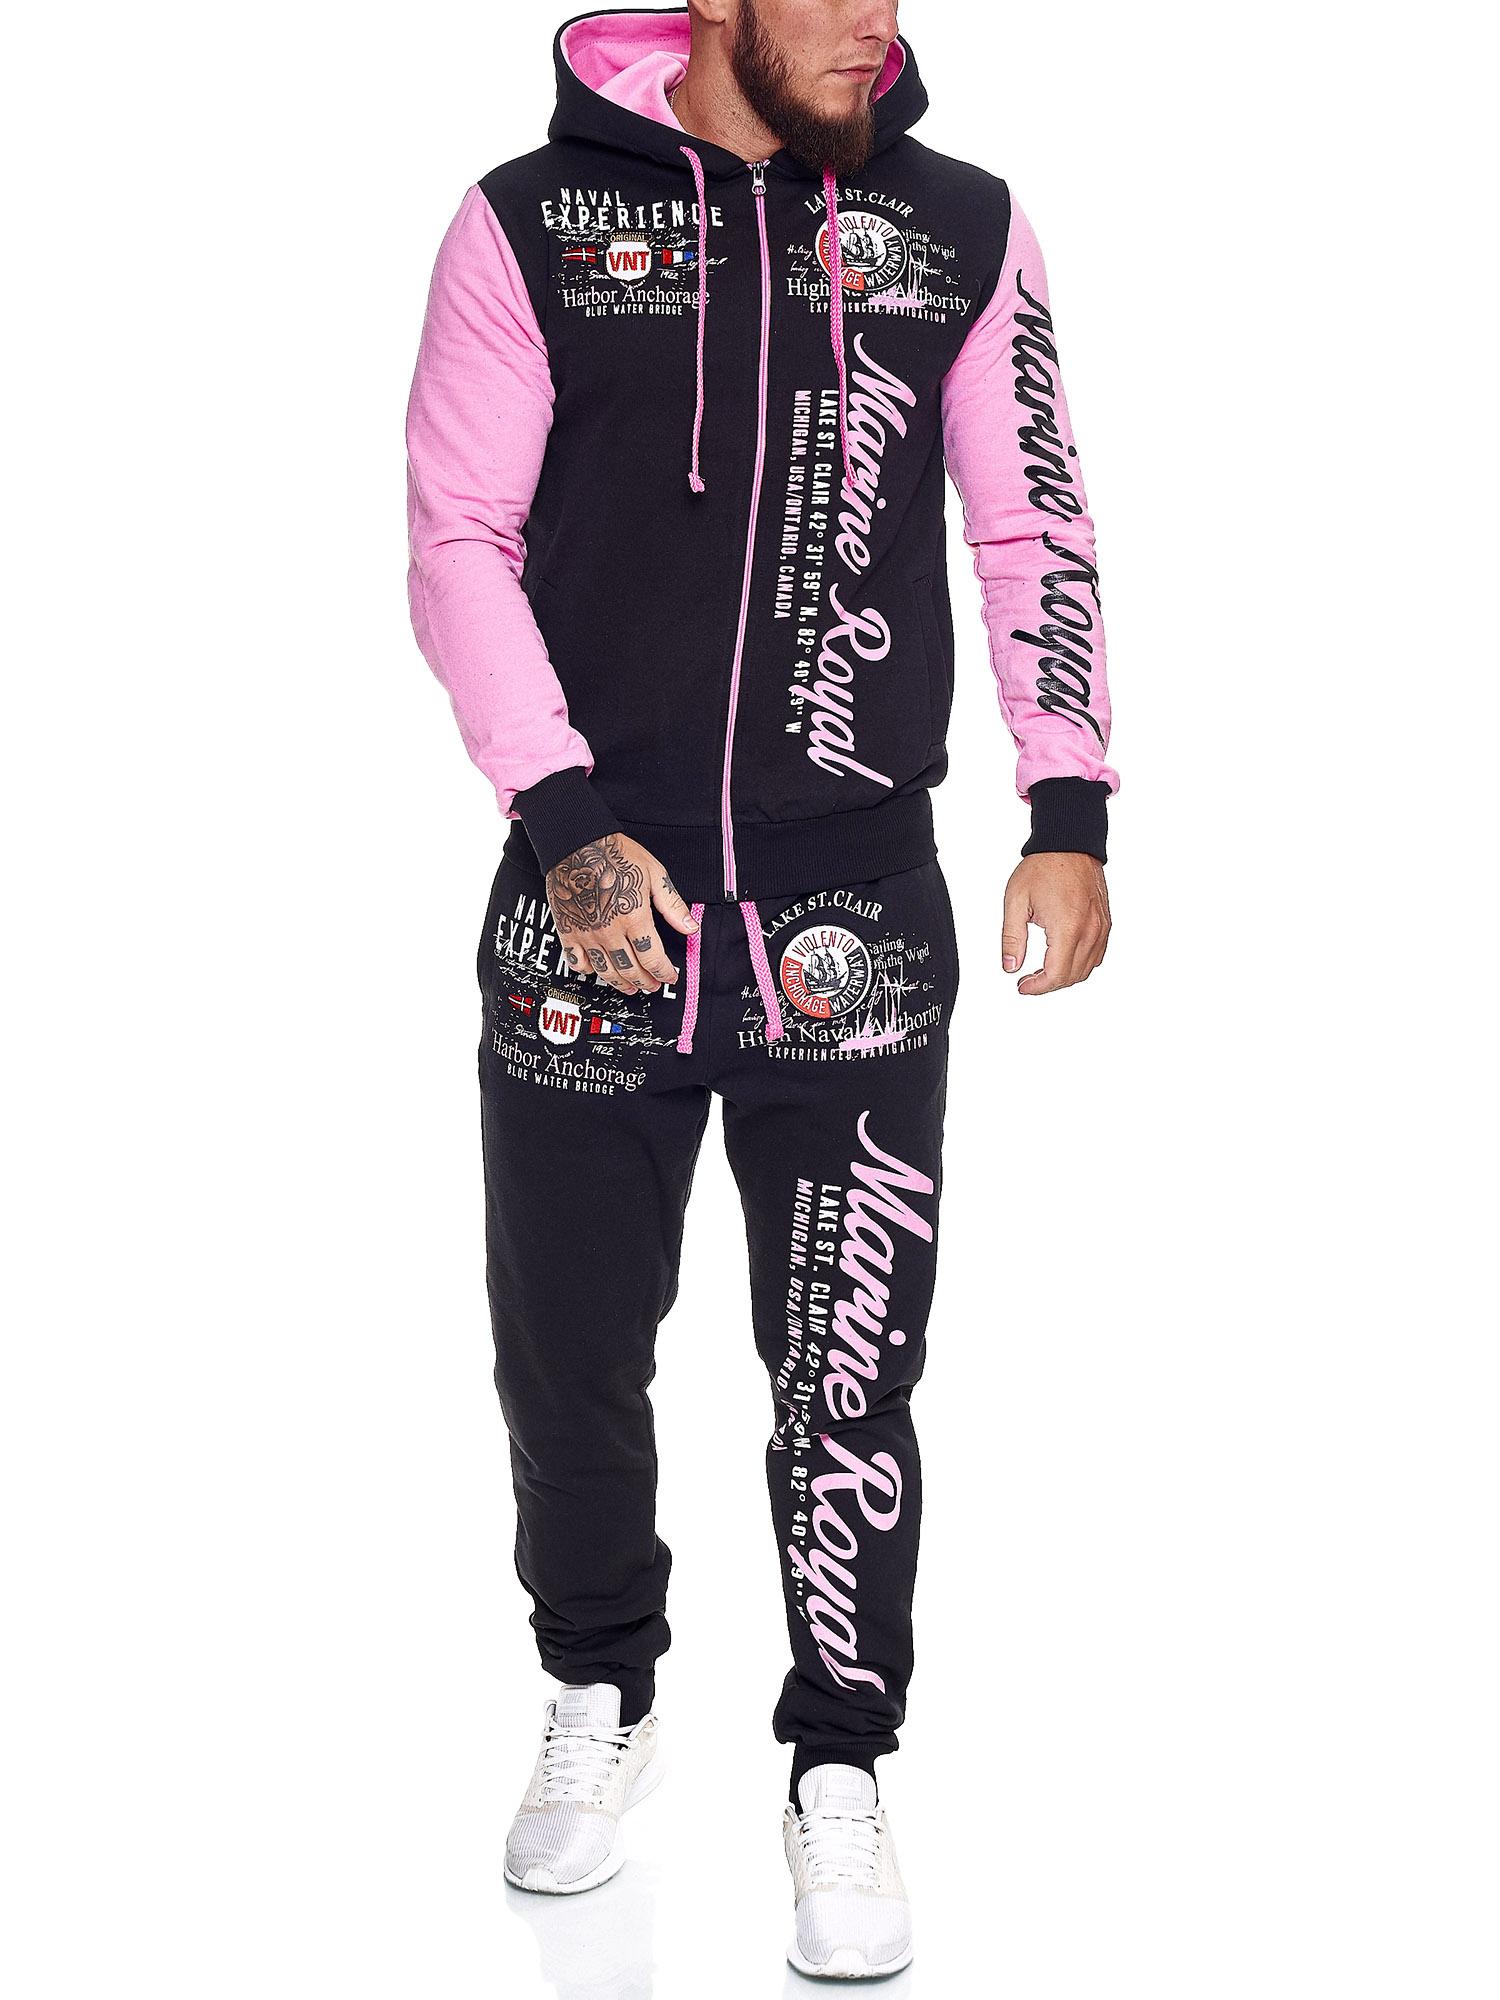 Damen-Jogginganzug-Frauen-Trainingsanzug-Sportanzug-Streetwear-JG-512-John-Kayna Indexbild 35